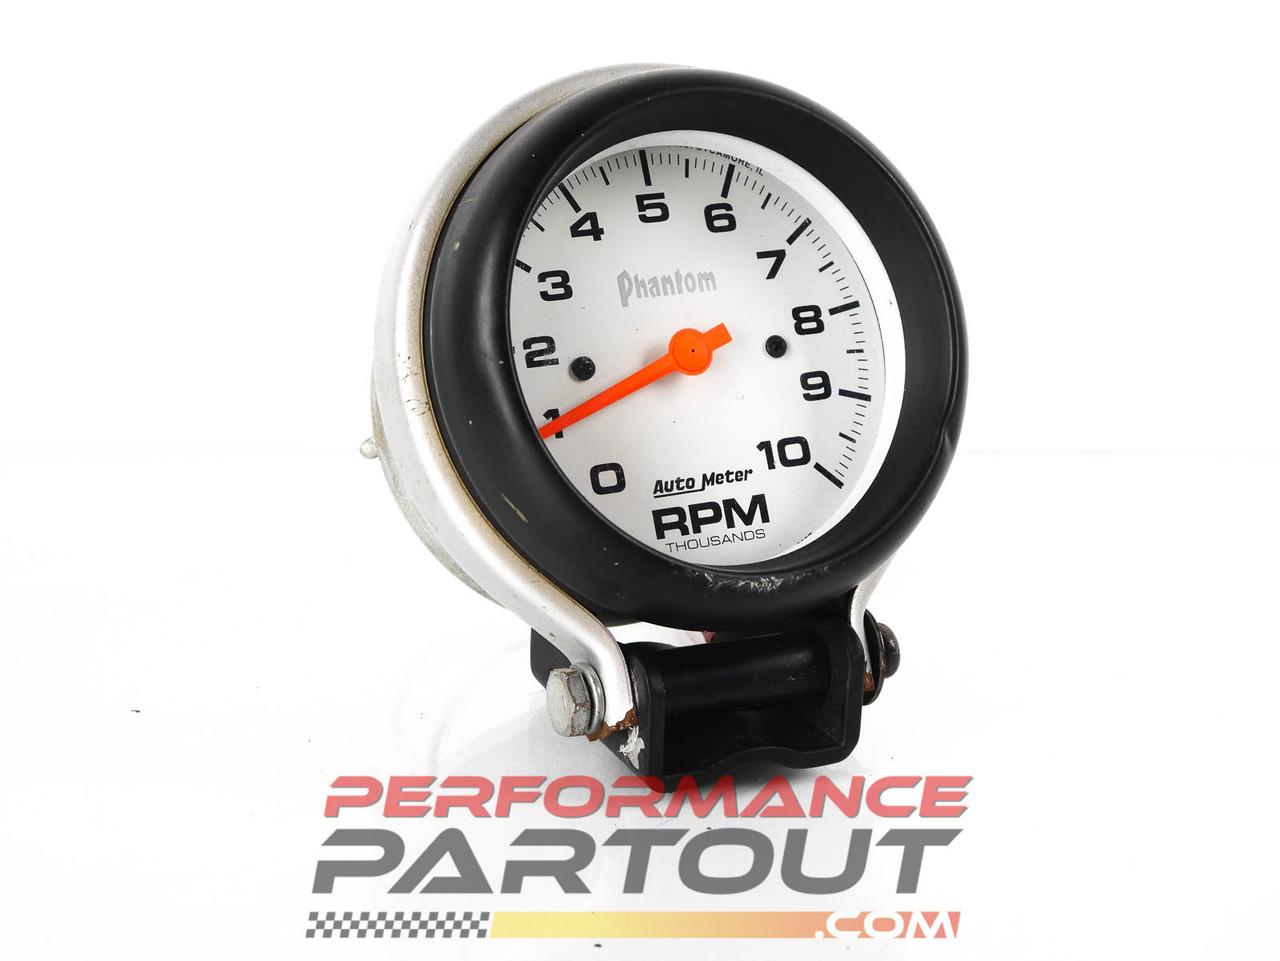 Autometer Phantom 10k rpm Tachometer 5897